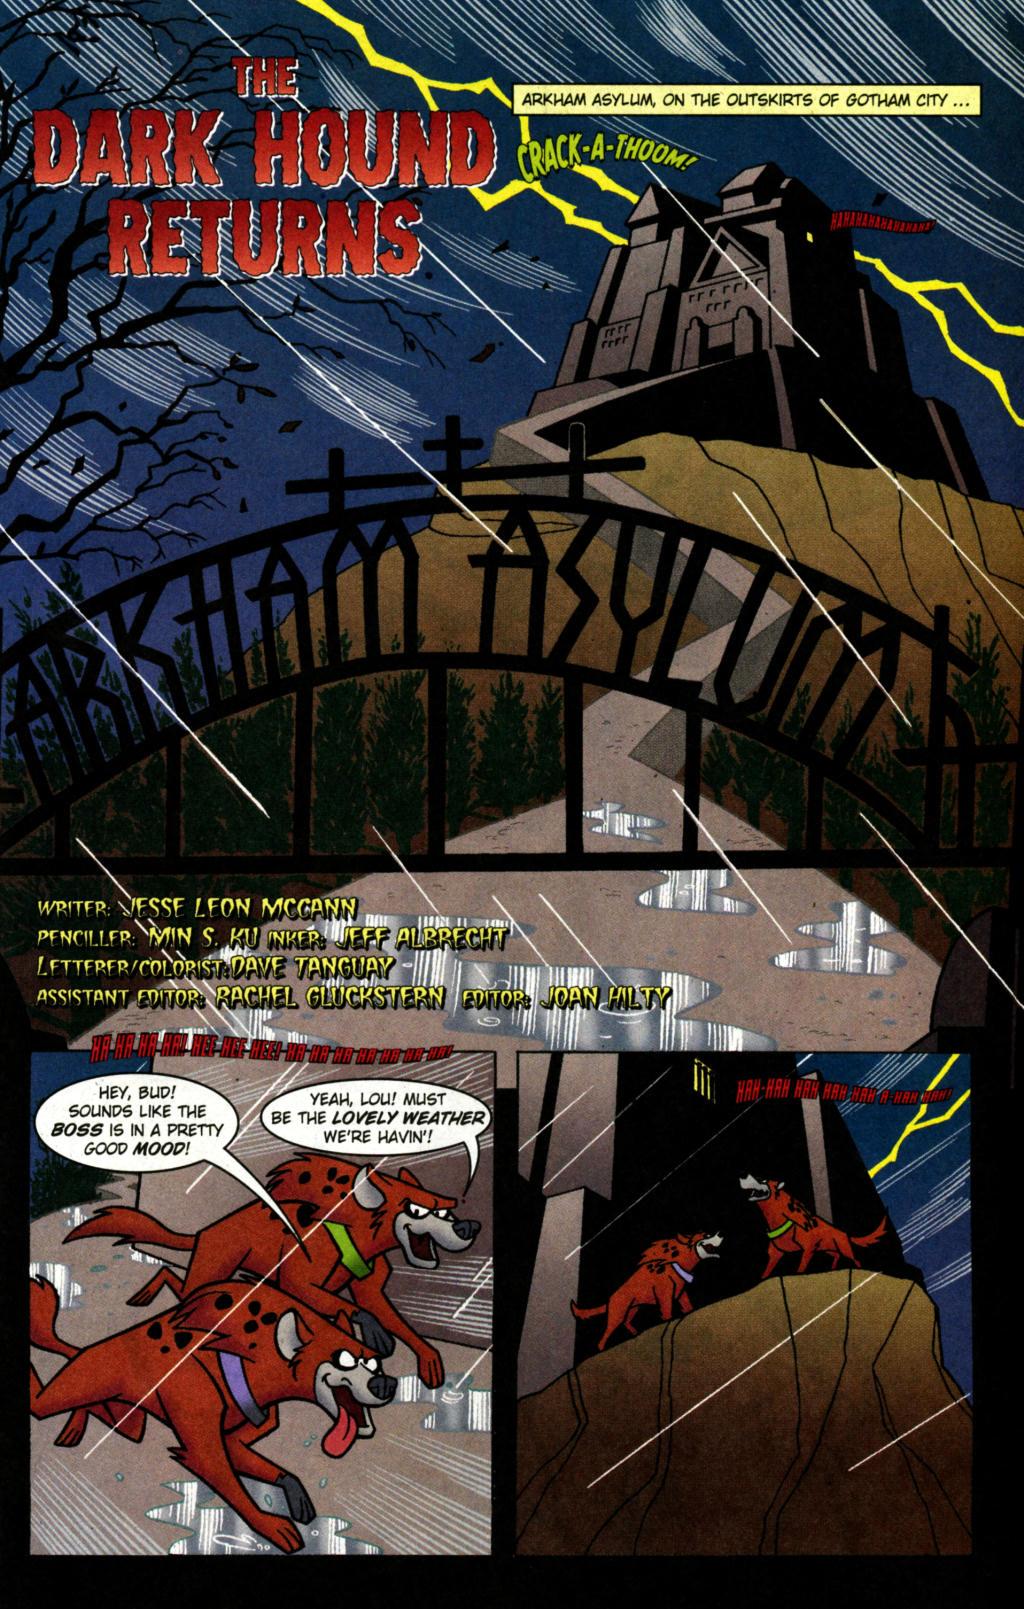 Read online Krypto the Superdog comic -  Issue #1 - 12